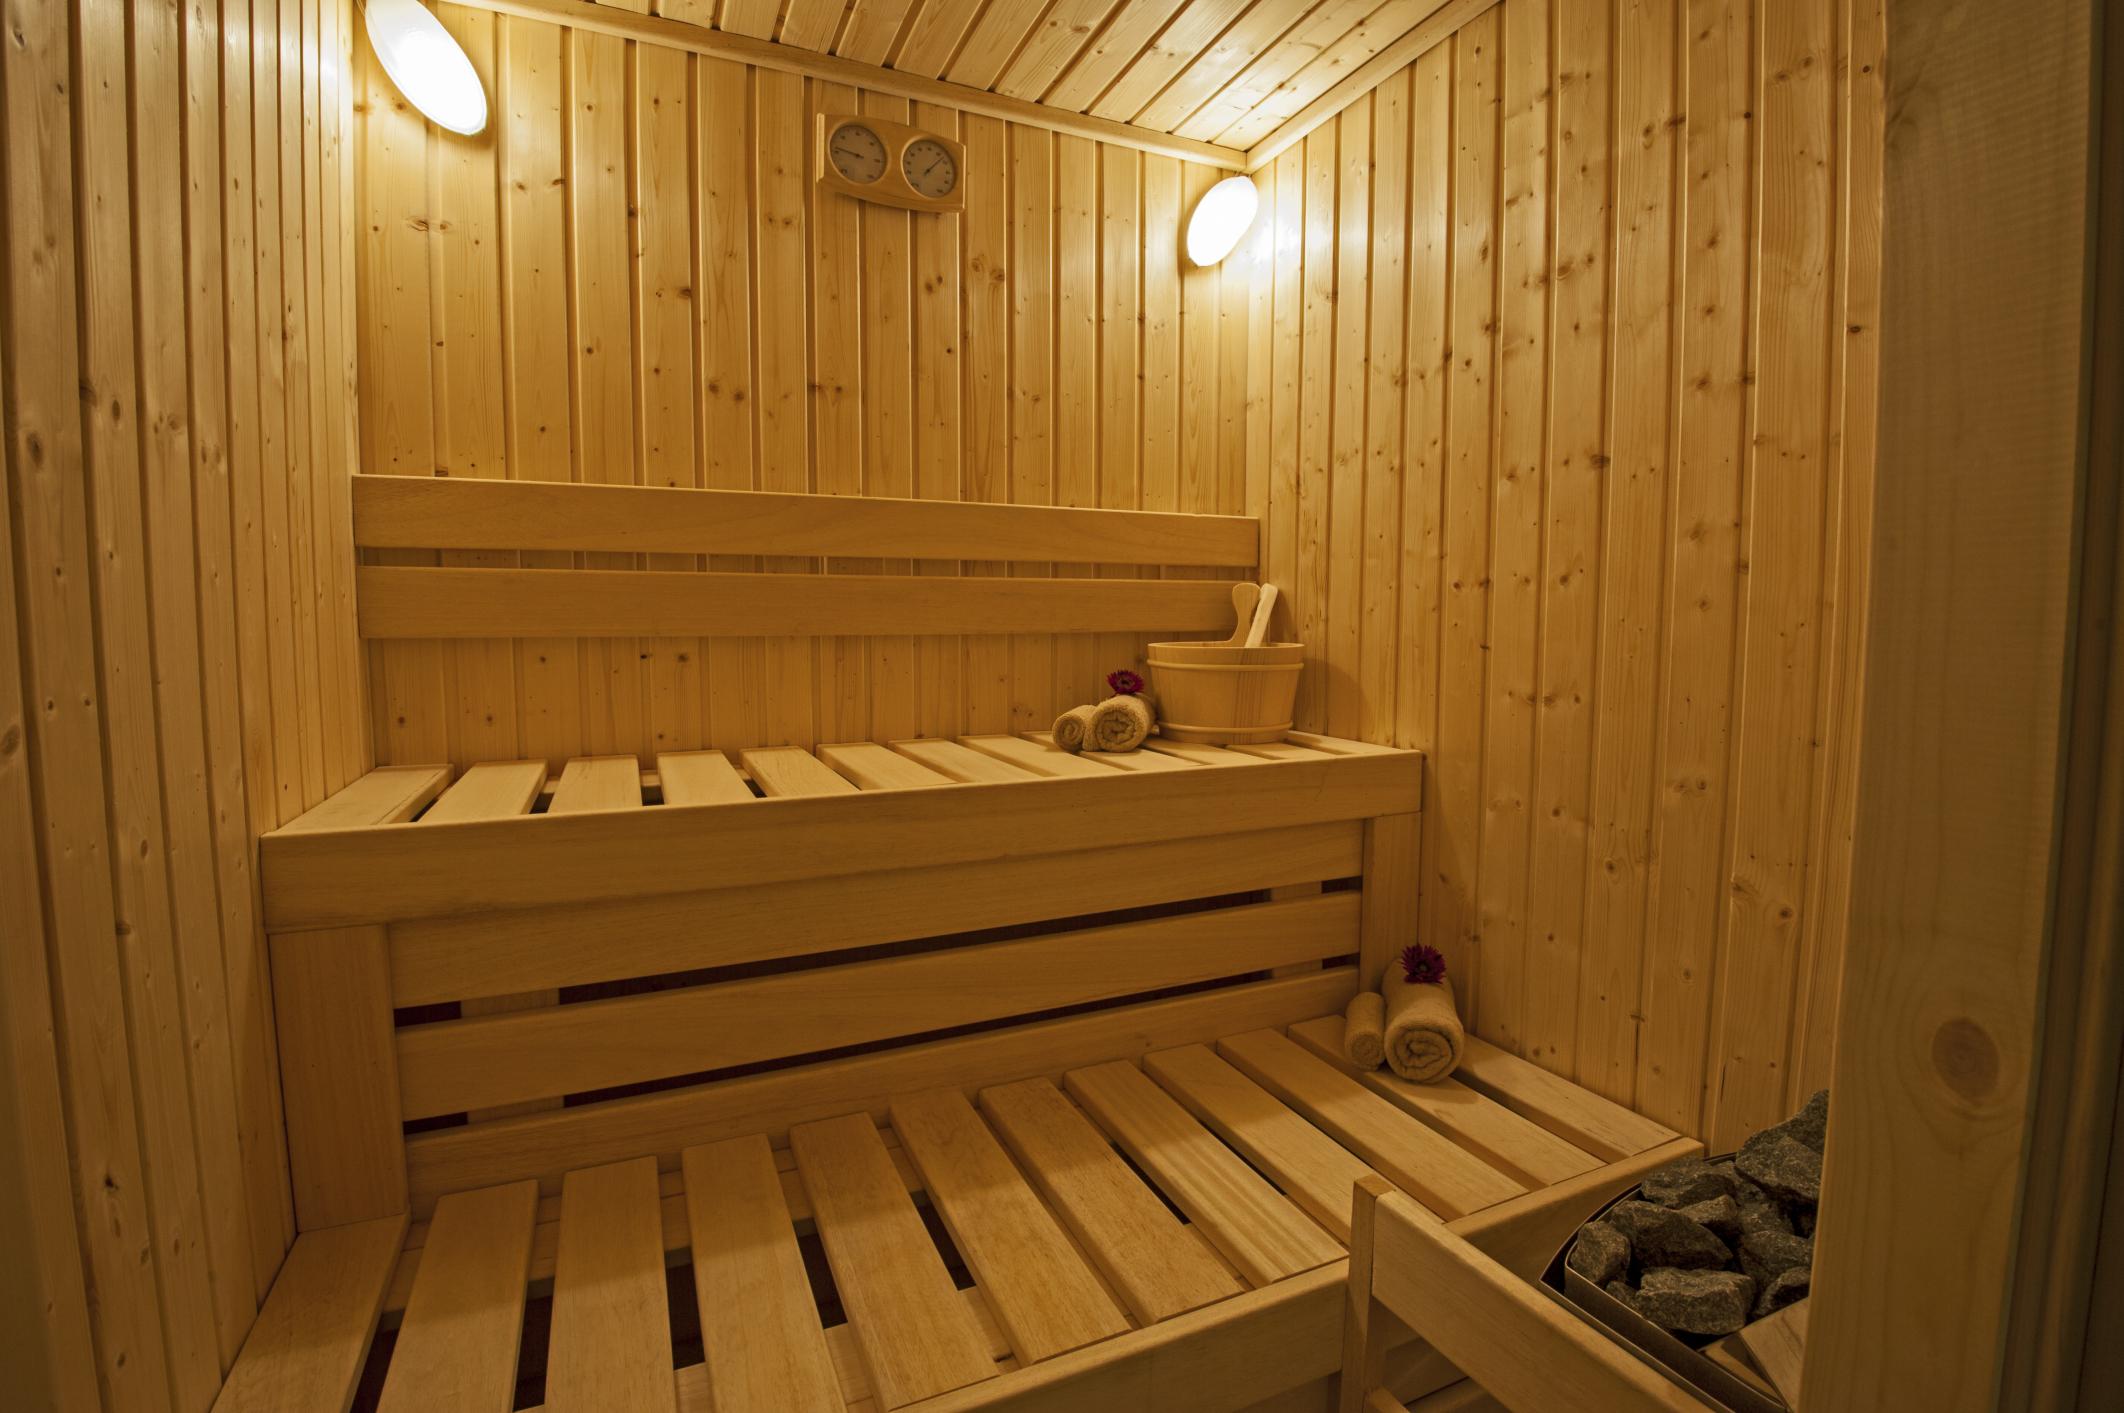 from outside burning a inside the dsc sauna building glenn room saunatimes wood hi or feed